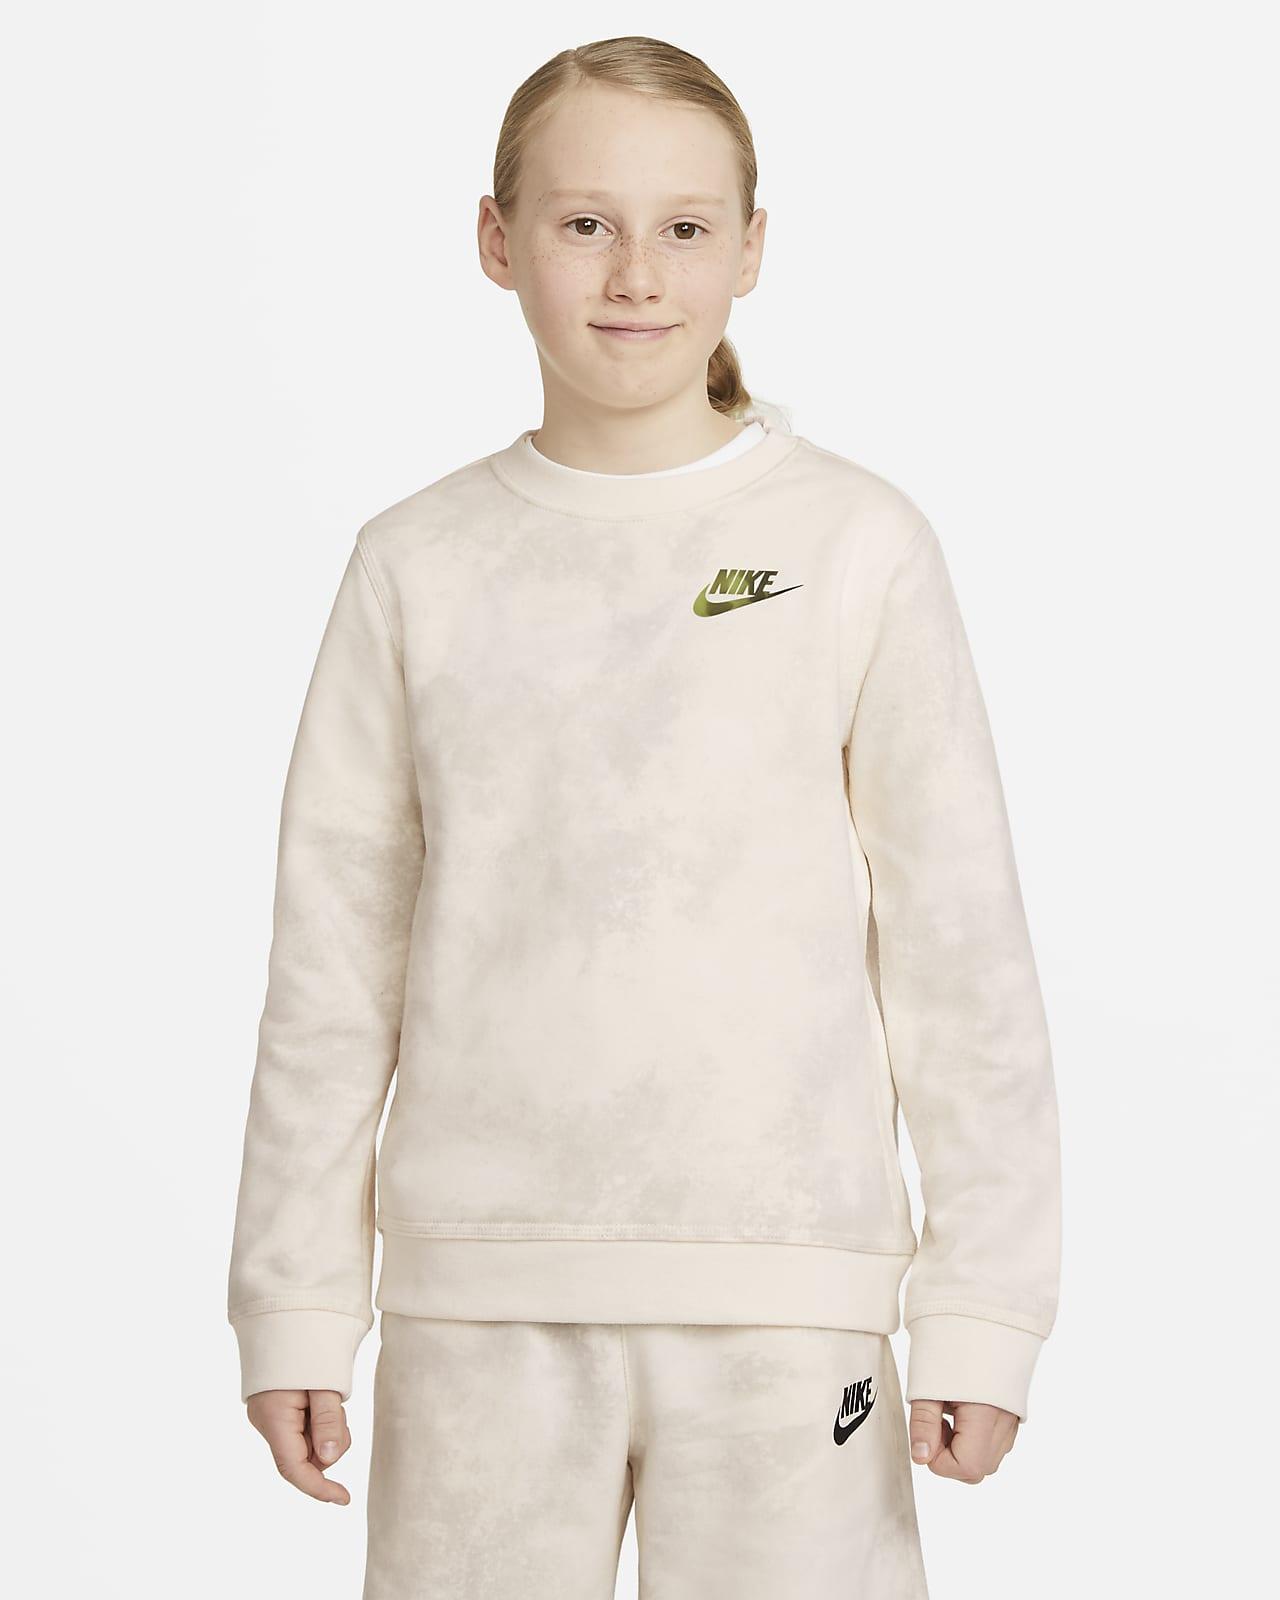 Nike Sportswear Magic Club Older Kids' (Boys') Tie-Dye Crew